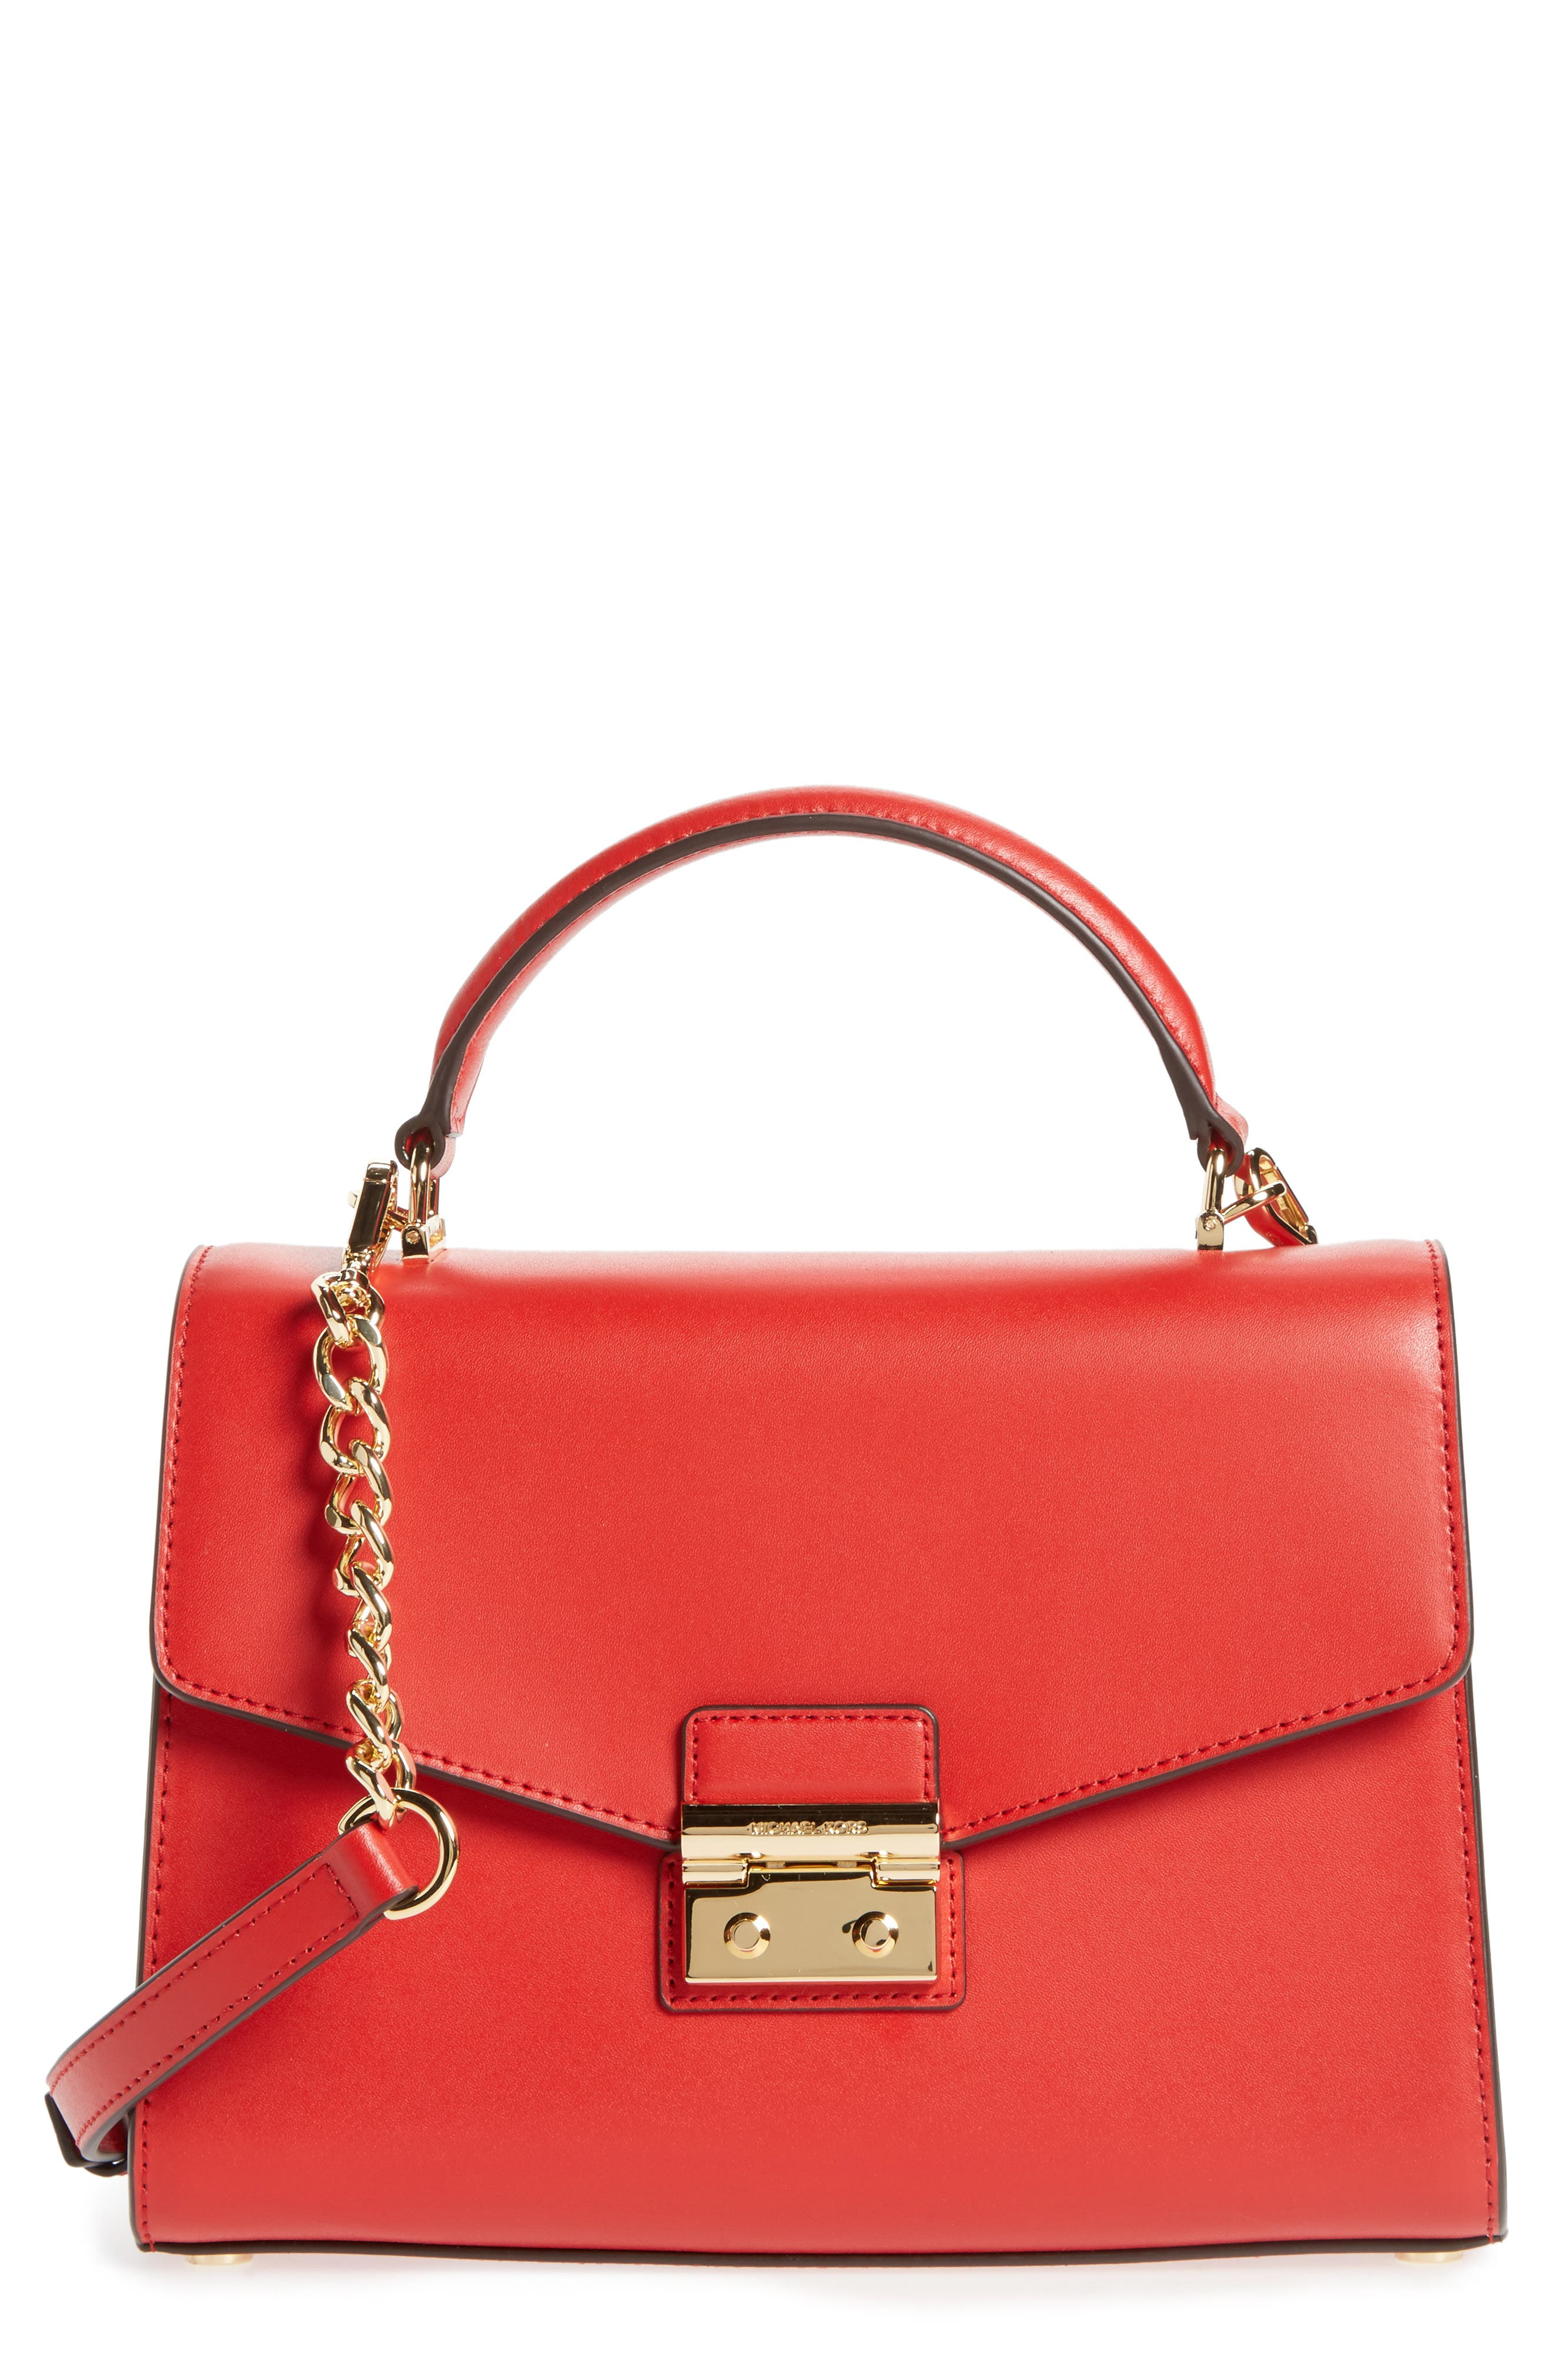 MICHAEL Michael Kors Medium Sloan Leather Satchel,                         Main,                         color, Bright Red